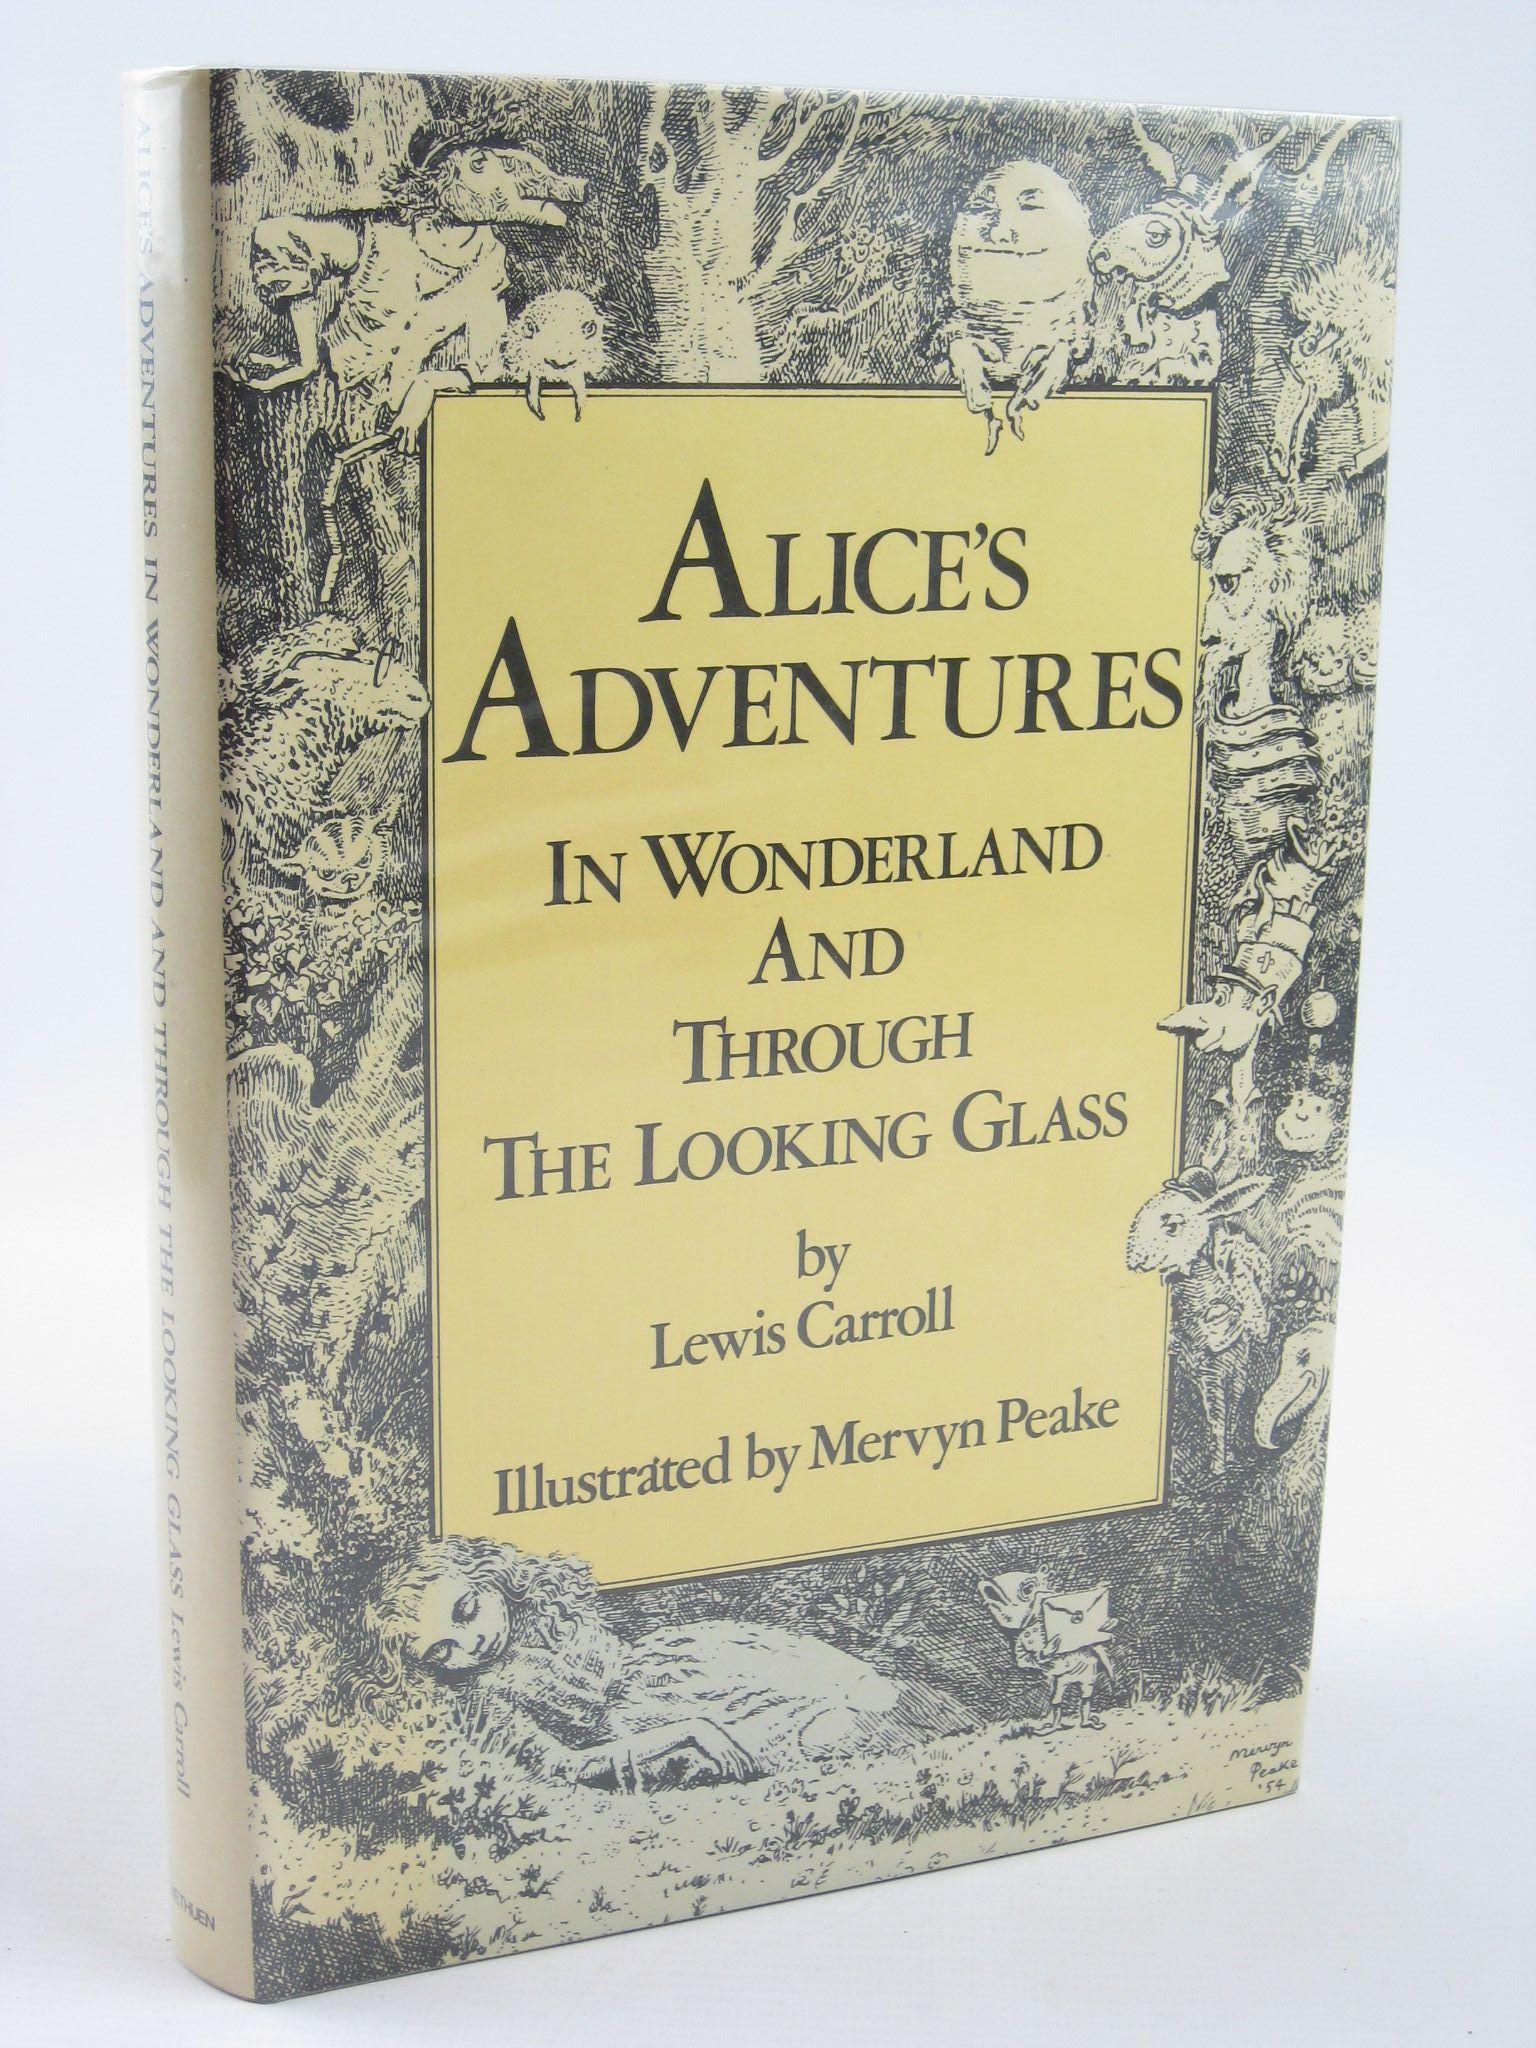 Alice in wonderland background story-4345